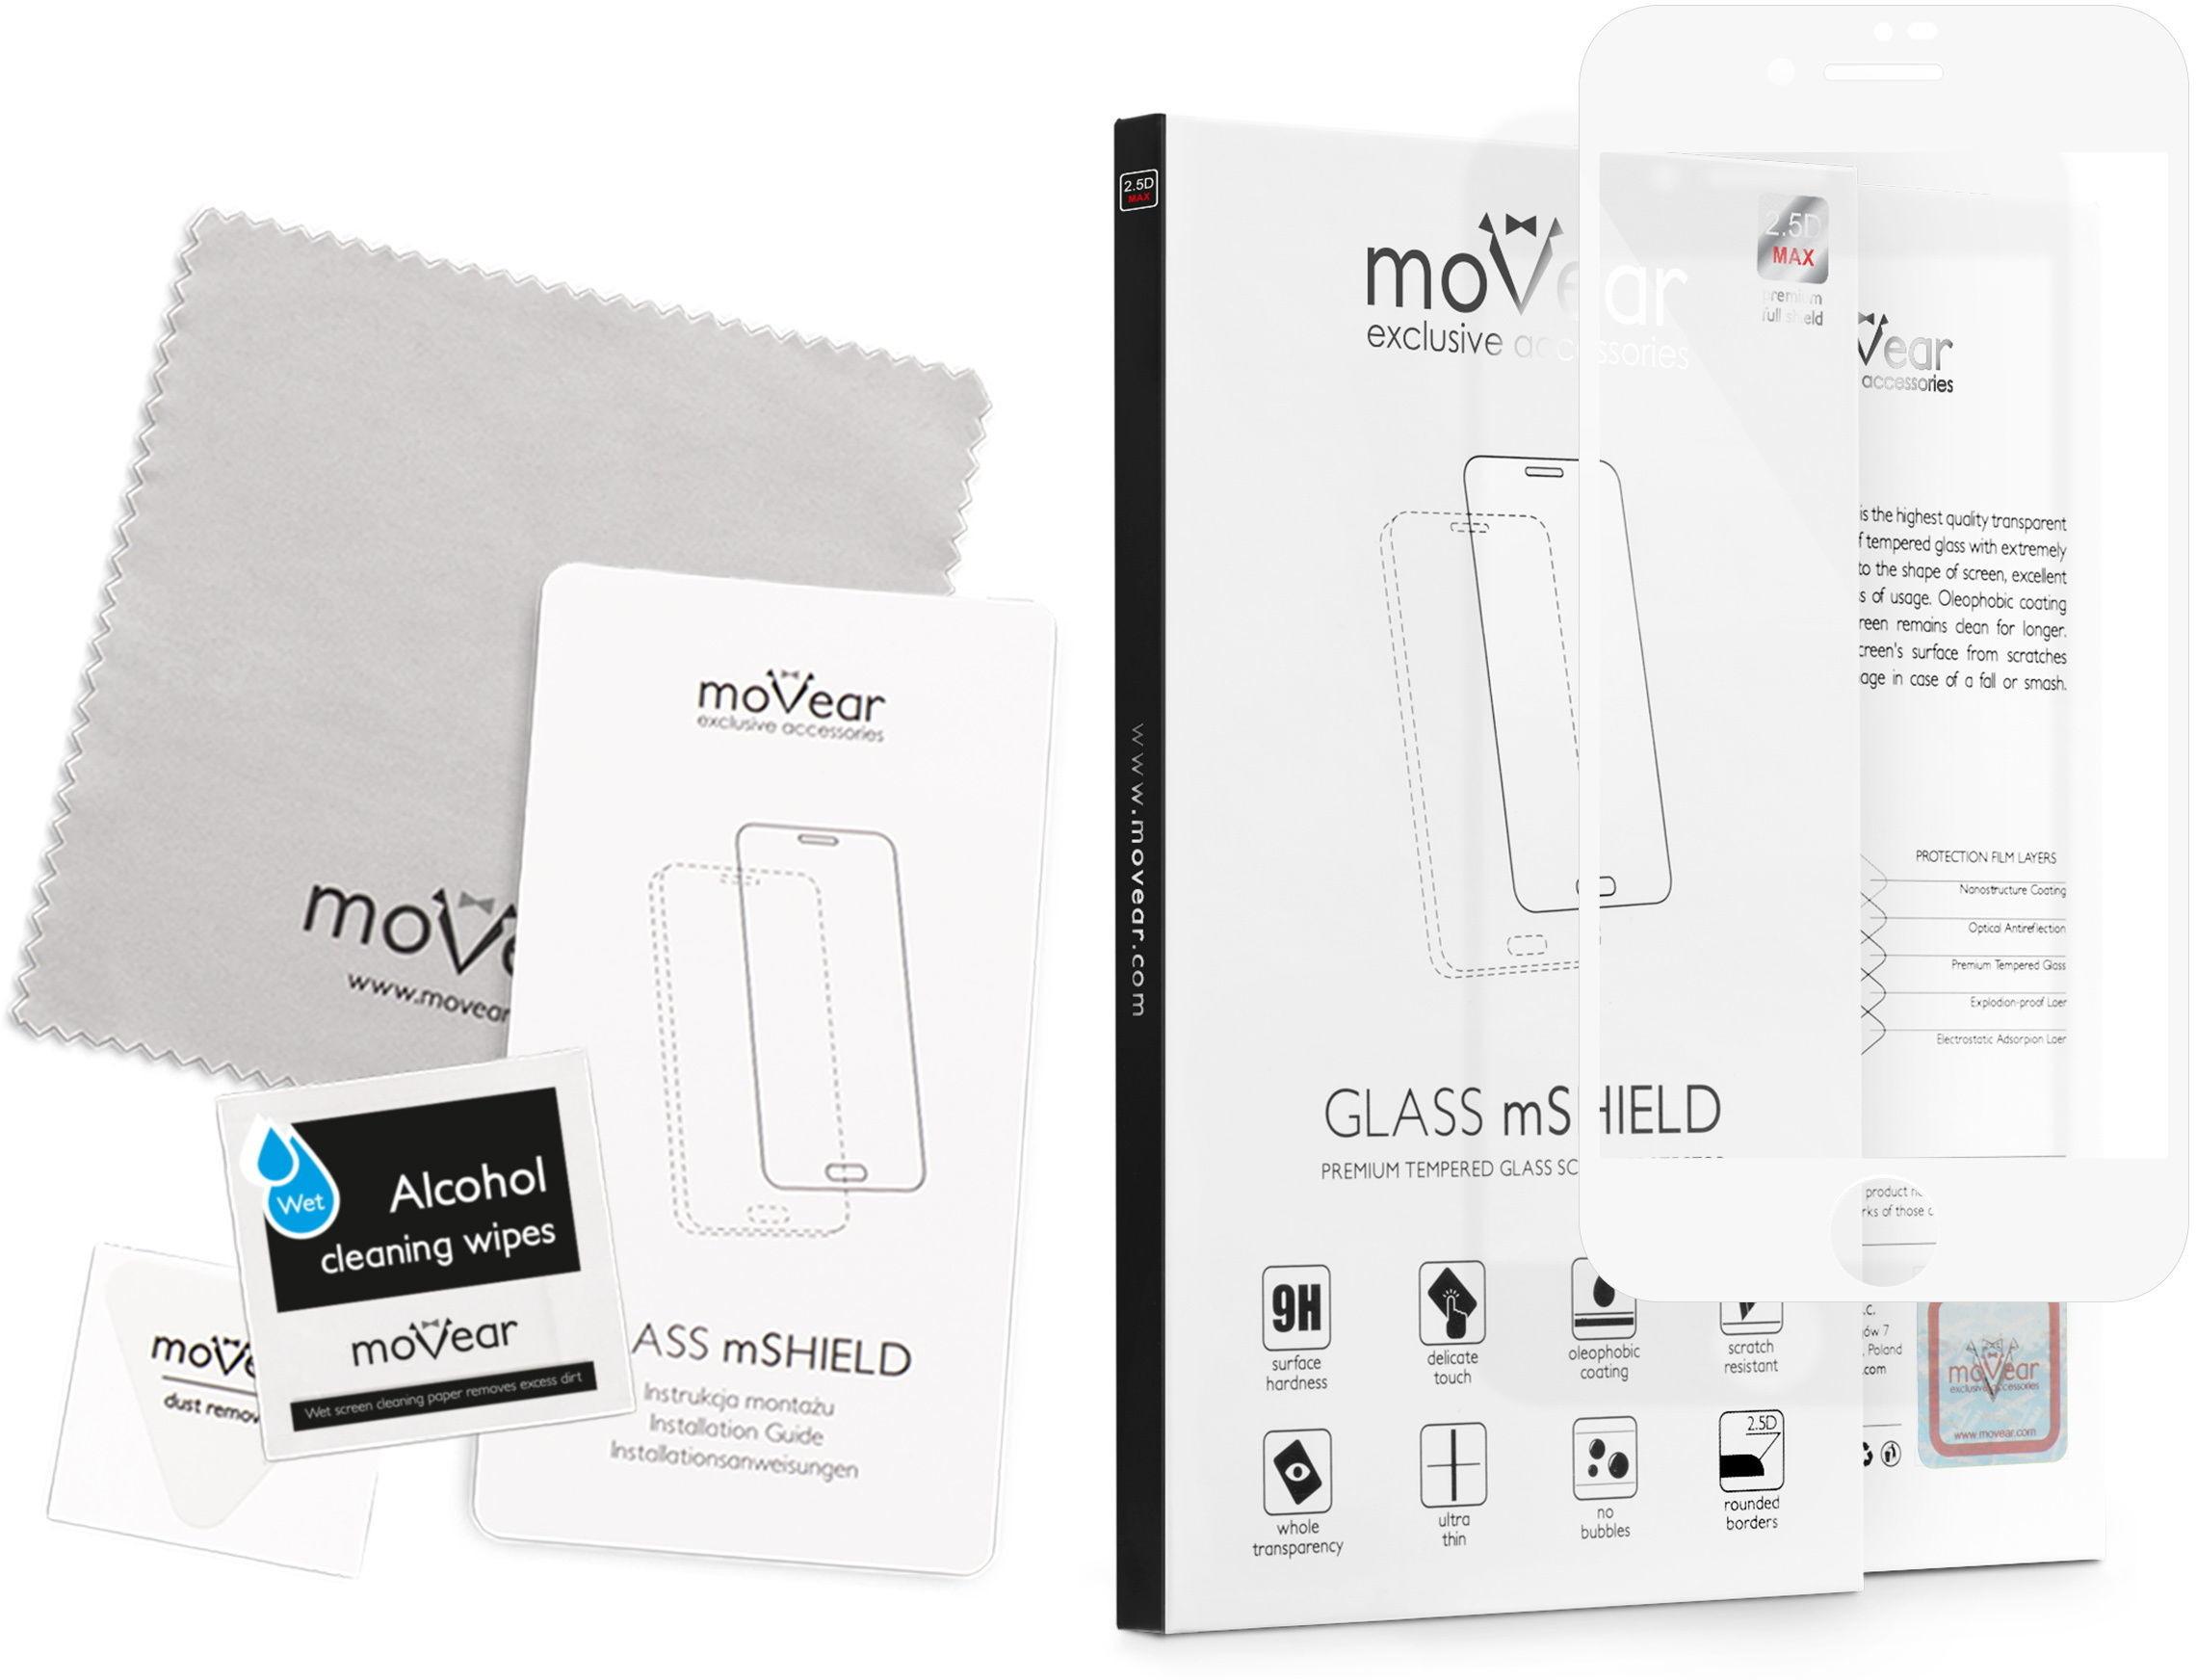 movear Szkło Hartowane 2.5D MAX na iPhone 8 plus / 7 plus Pyłoszczelne Full Glue Cały Ekran AI87PGMM03AWH